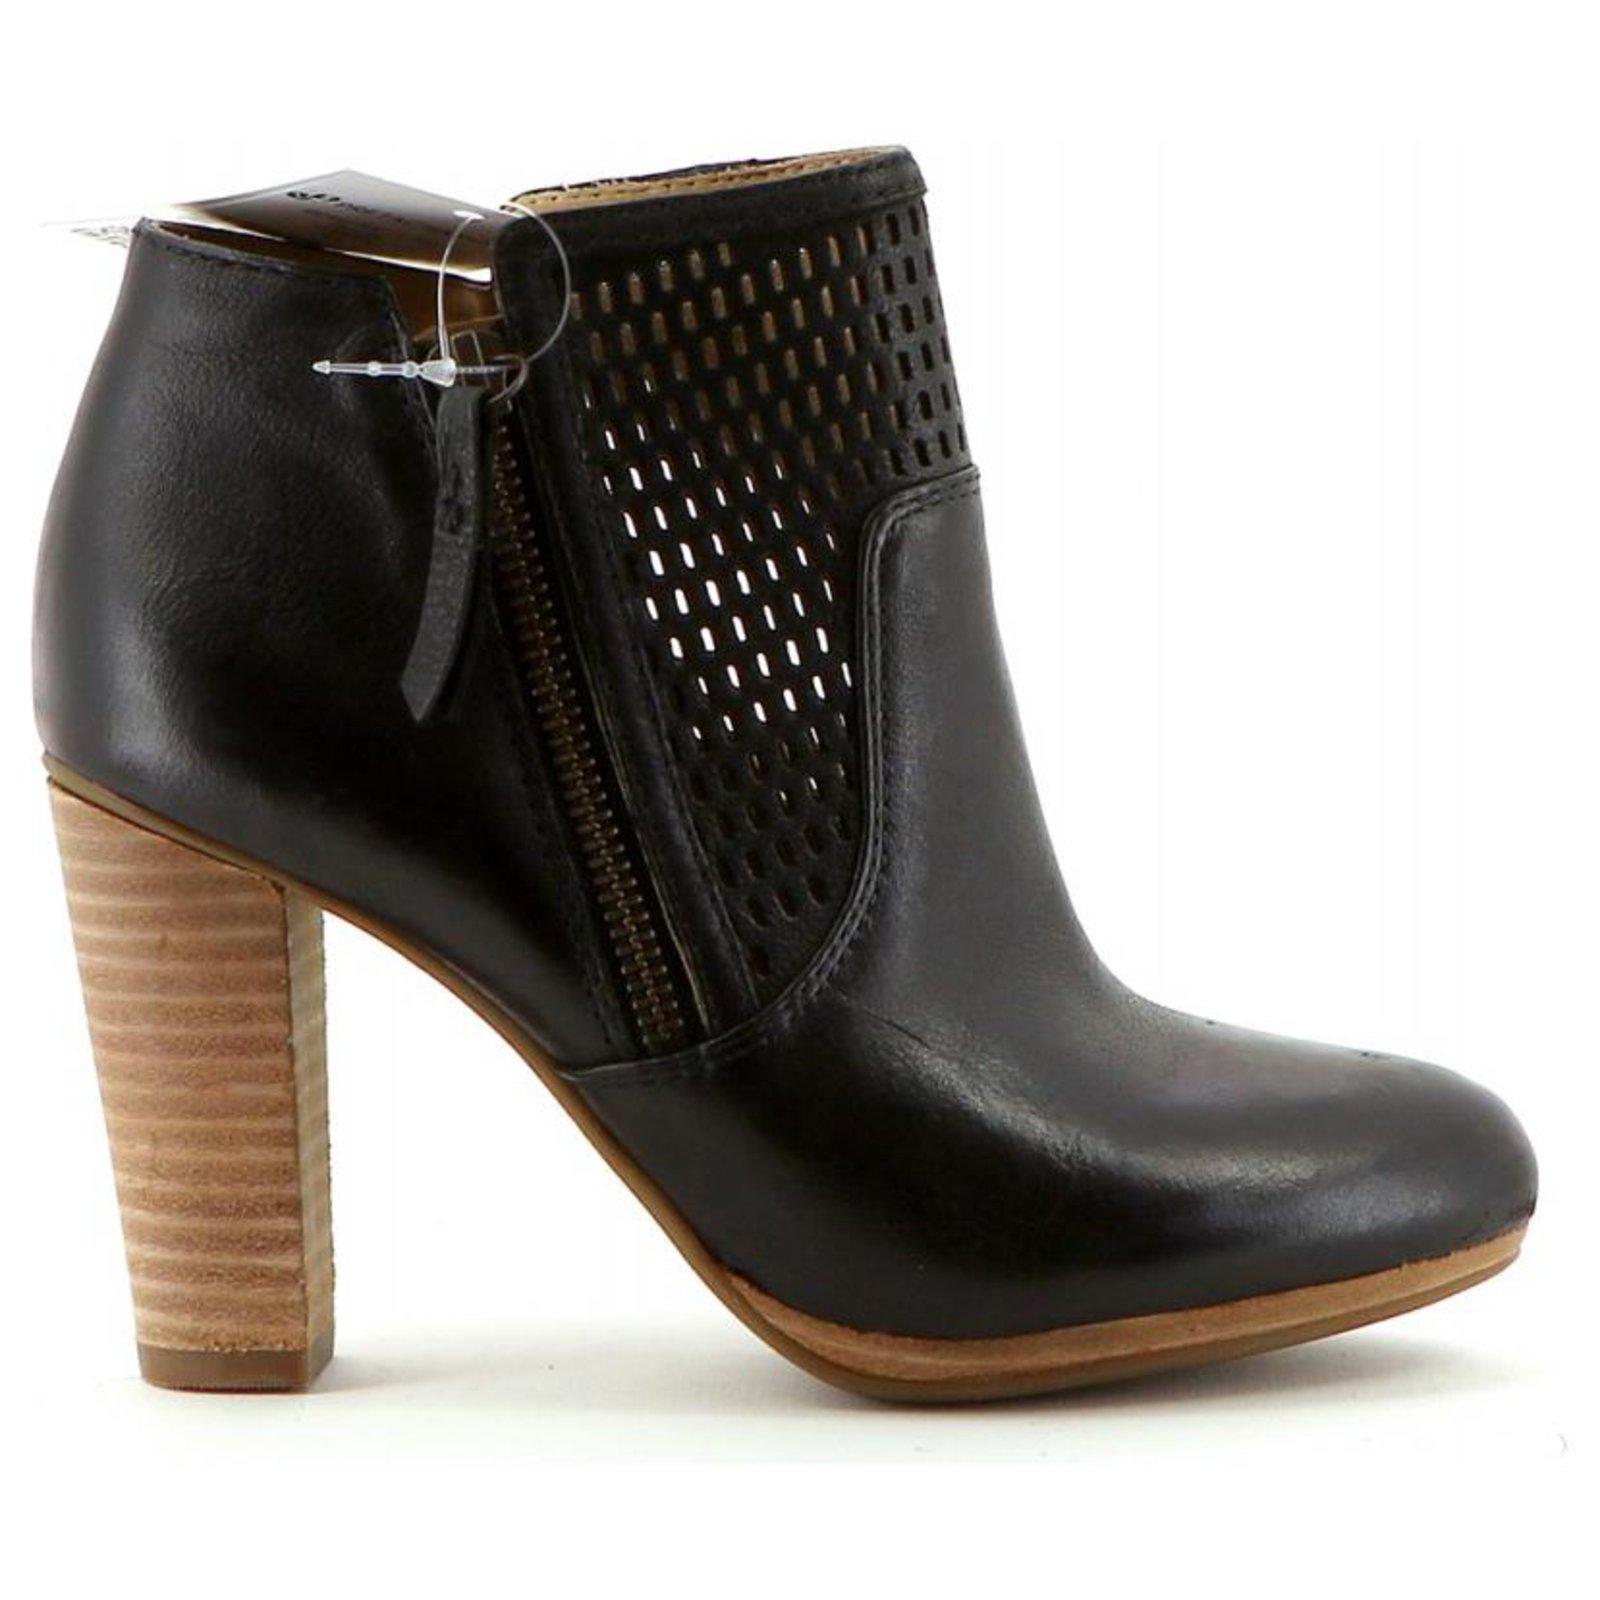 Fangoso Cuatro águila  Geox Ankle Boots / Low Boots Ankle Boots Leather Black ref.202322 - Joli  Closet